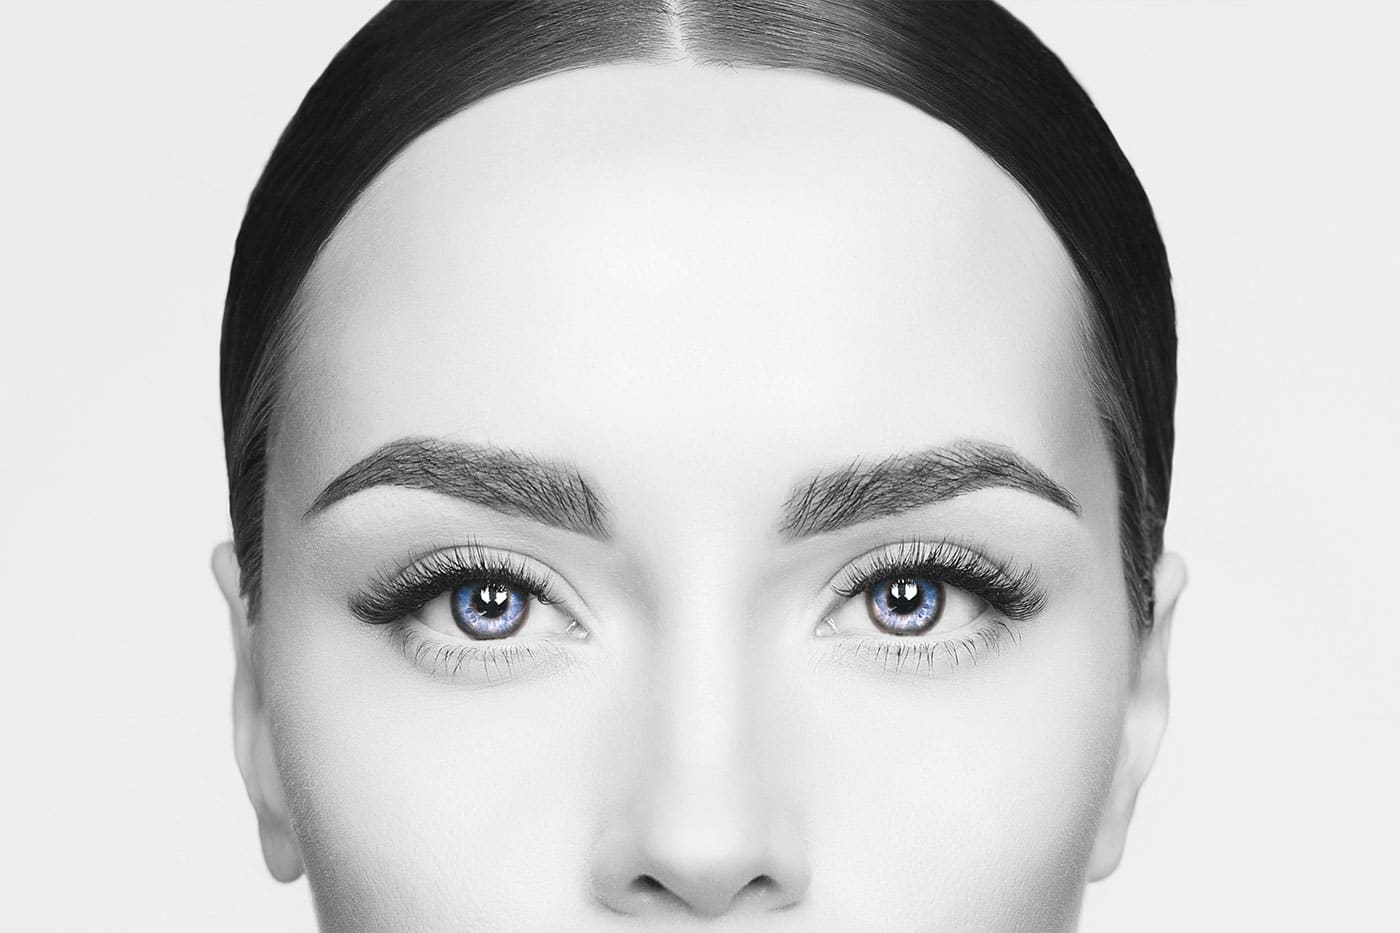 Botox and Other Neuromodulators